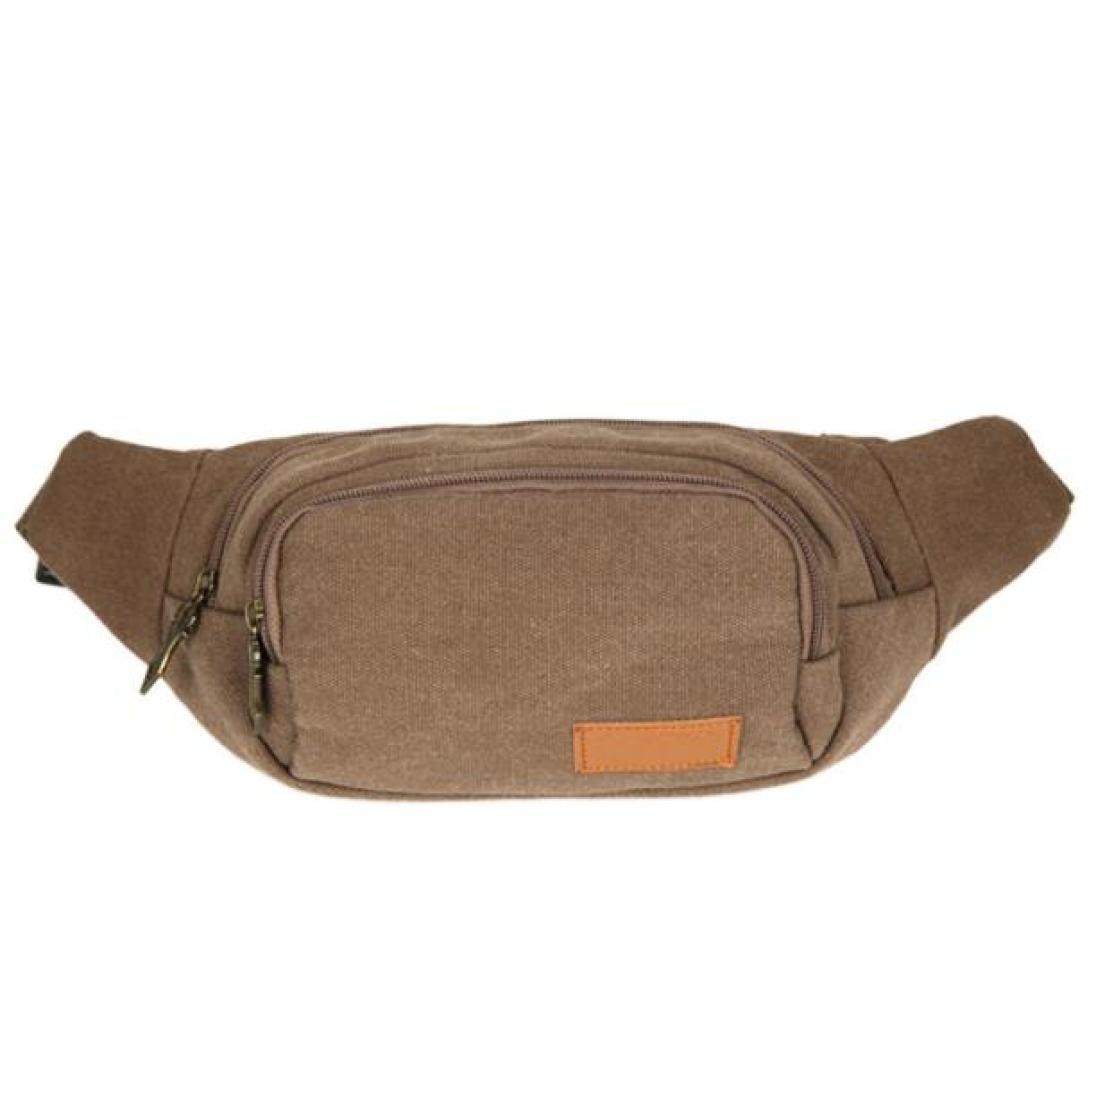 Outdoor Sports Running Waist Packs Travel Shoulder Chest Bag Inkach Unisex Fanny Packs